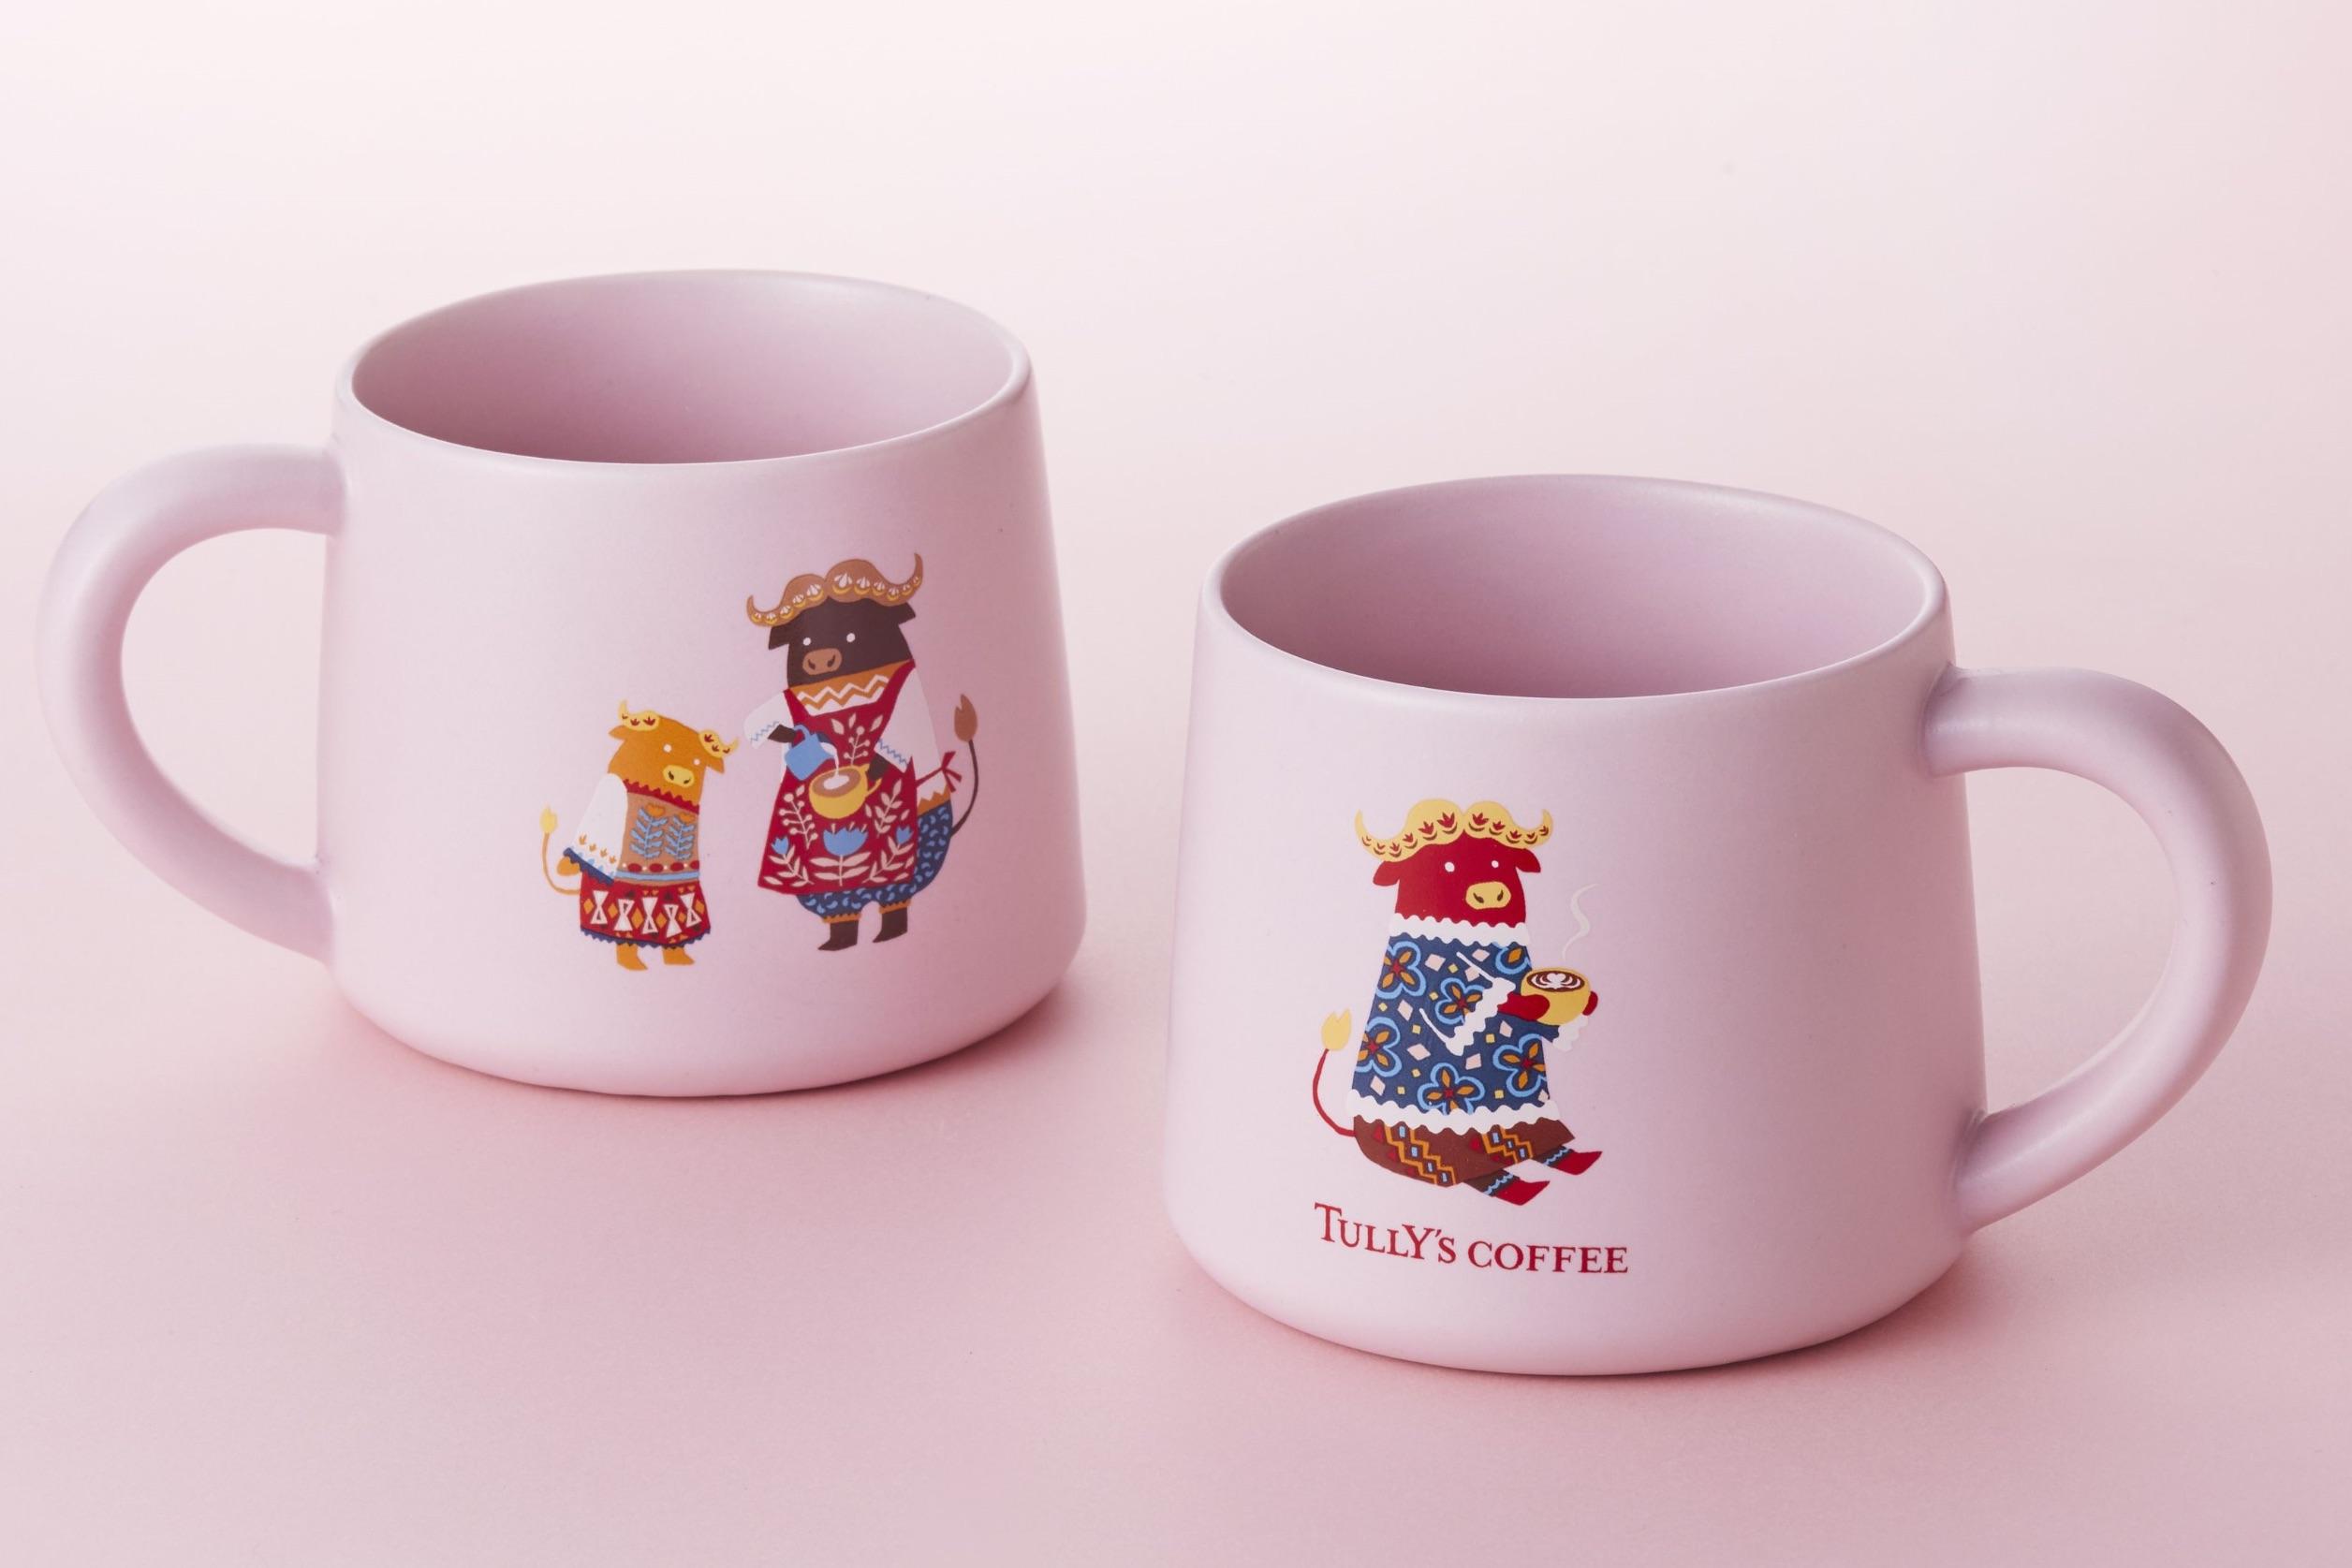 %e3%82%bf%e3%83%aa%e3%83%bc%e3%82%ba%e3%82%b3%e3%83%bc%e3%83%92%e3%83%bc-%e5%ae%87%e6%b2%bb%e6%8a%b9%e8%8c%b6-tullys-coffee-matcha-drink-%e9%a3%b2%e5%93%814-2